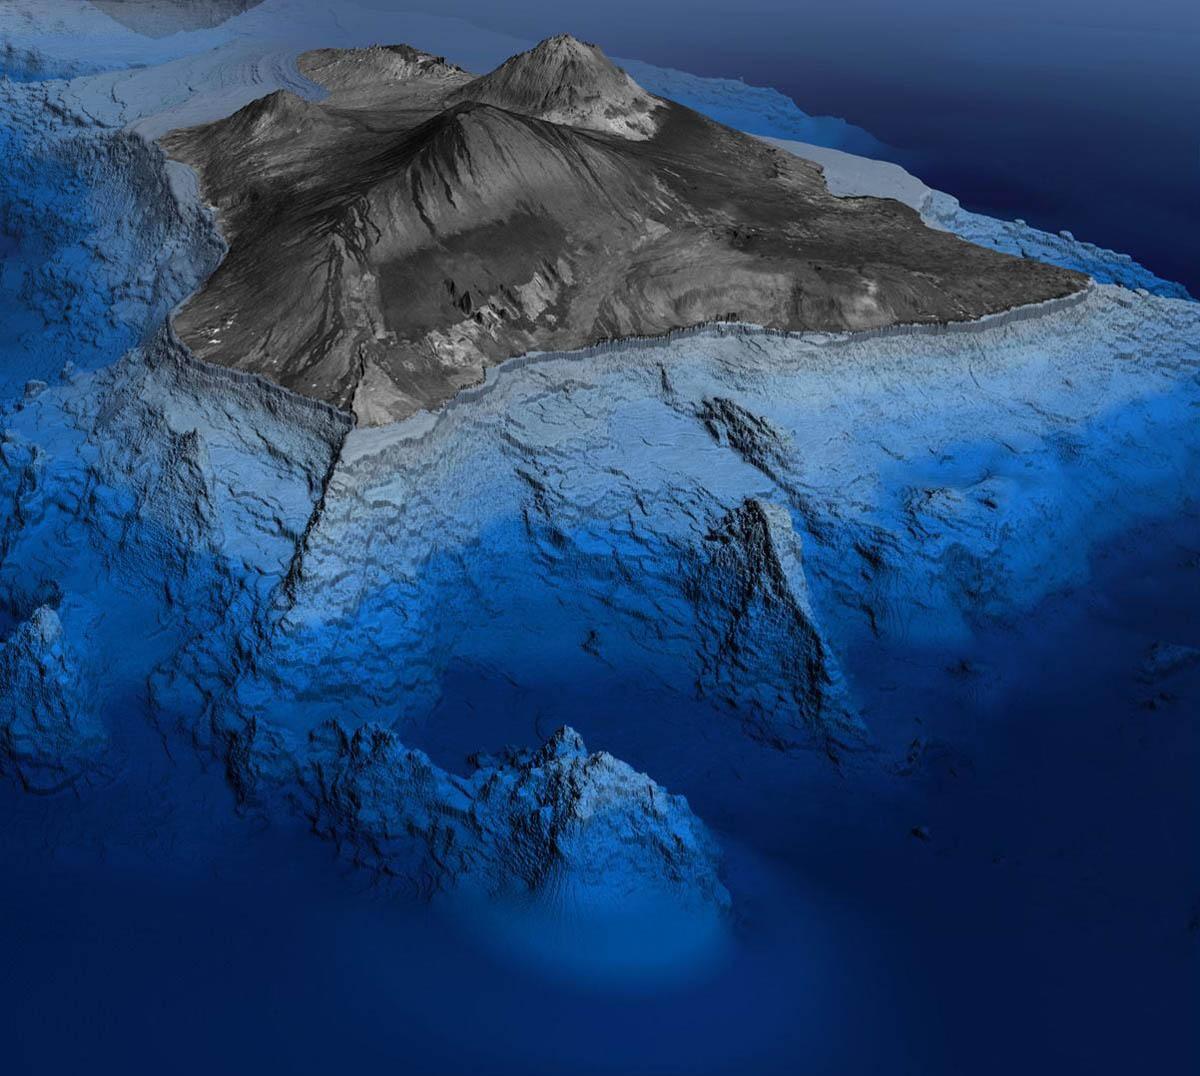 volcano Mauna Kea